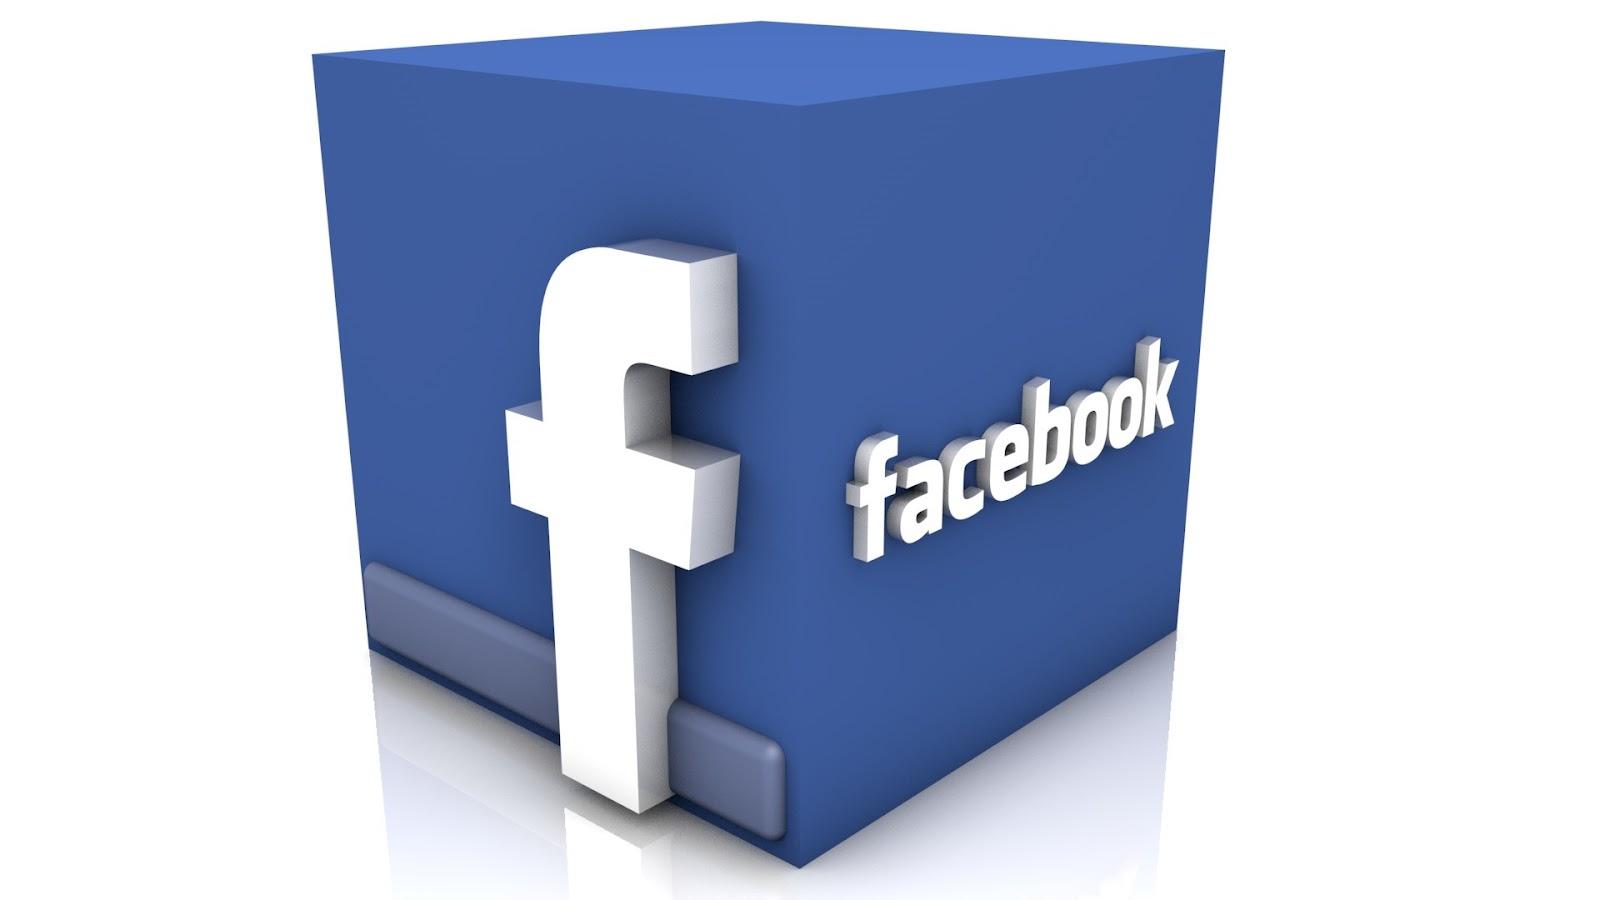 Facebook - Adventures of a London Kiwi